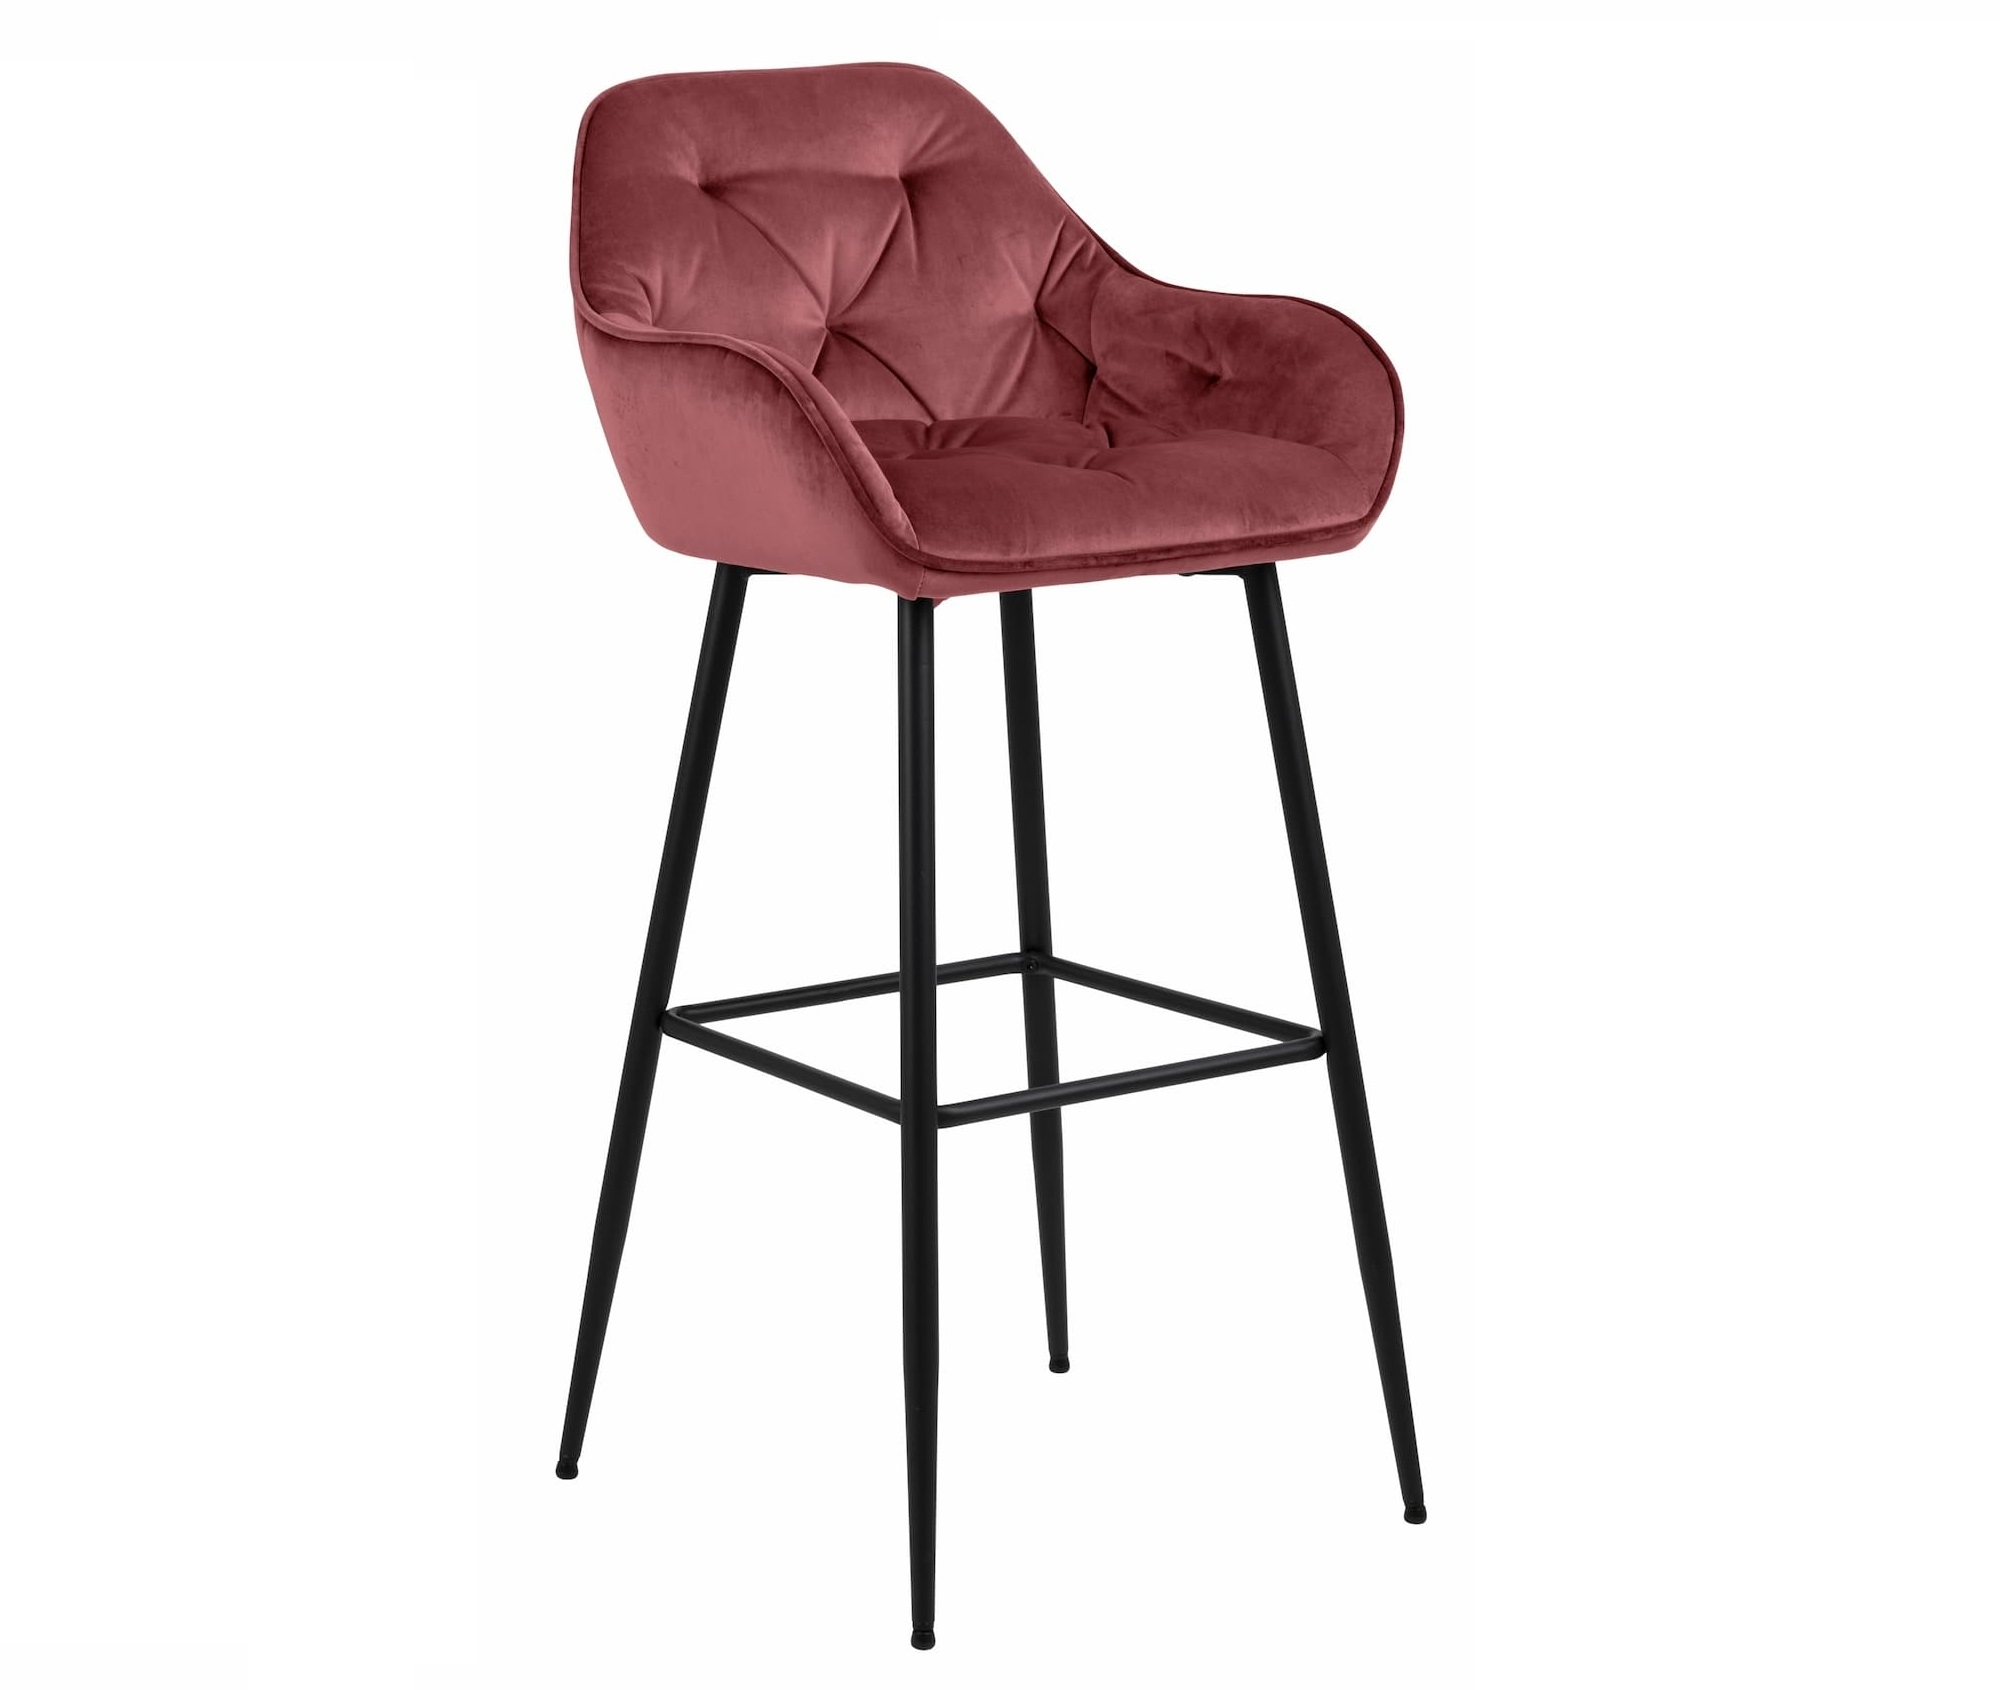 Scaun de bar tapitat cu stofa si picioare metalice Brooke Velvet Roz Inchis / Negru, l55xA52xH103,5 cm